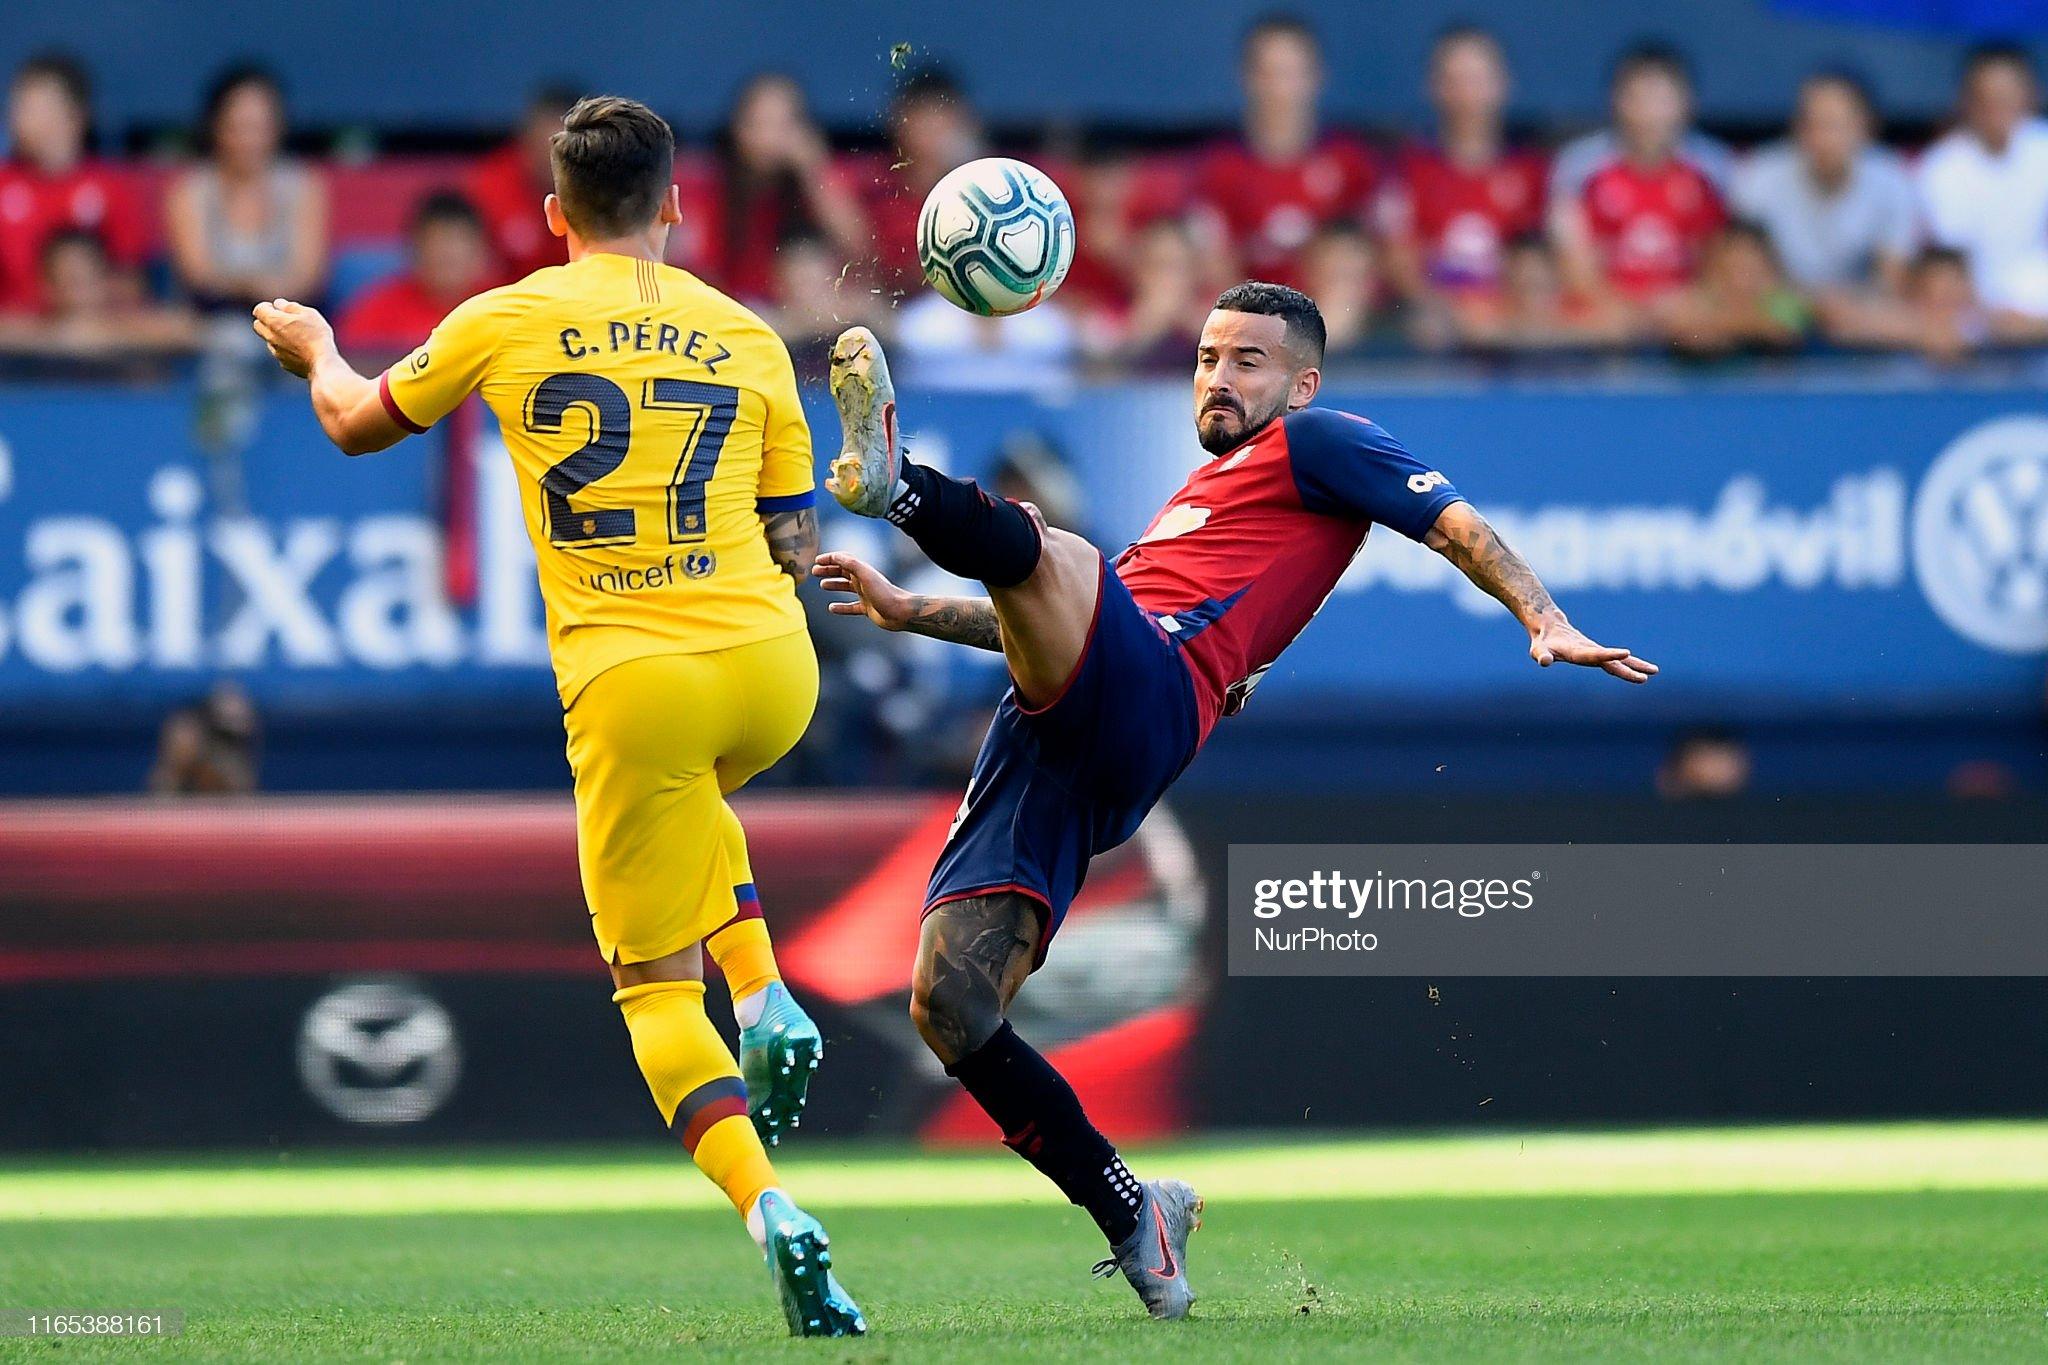 صور مباراة : أوساسونا - برشلونة 2-2 ( 31-08-2019 )  Ruben-garcia-of-osasuna-and-carles-perez-of-barcelona-competes-for-picture-id1165388161?s=2048x2048